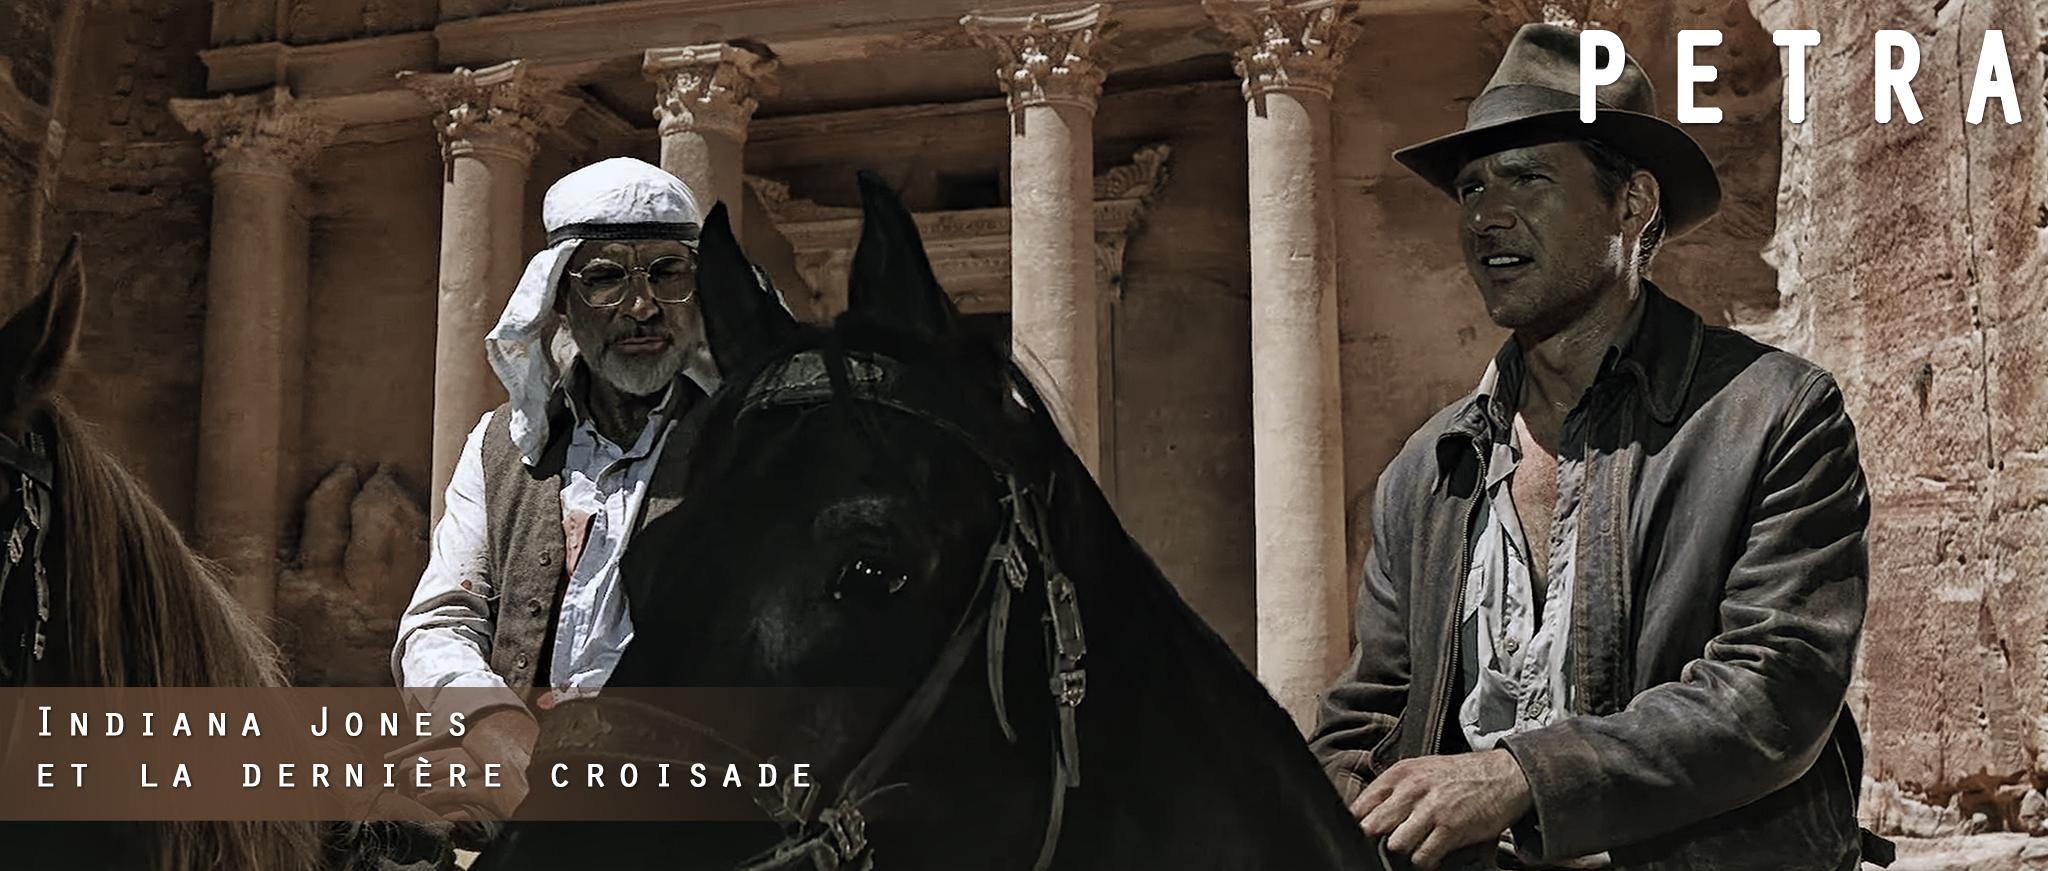 Indiana Jones et la dernière croisade - Petra ©Lucasfilm Ltd